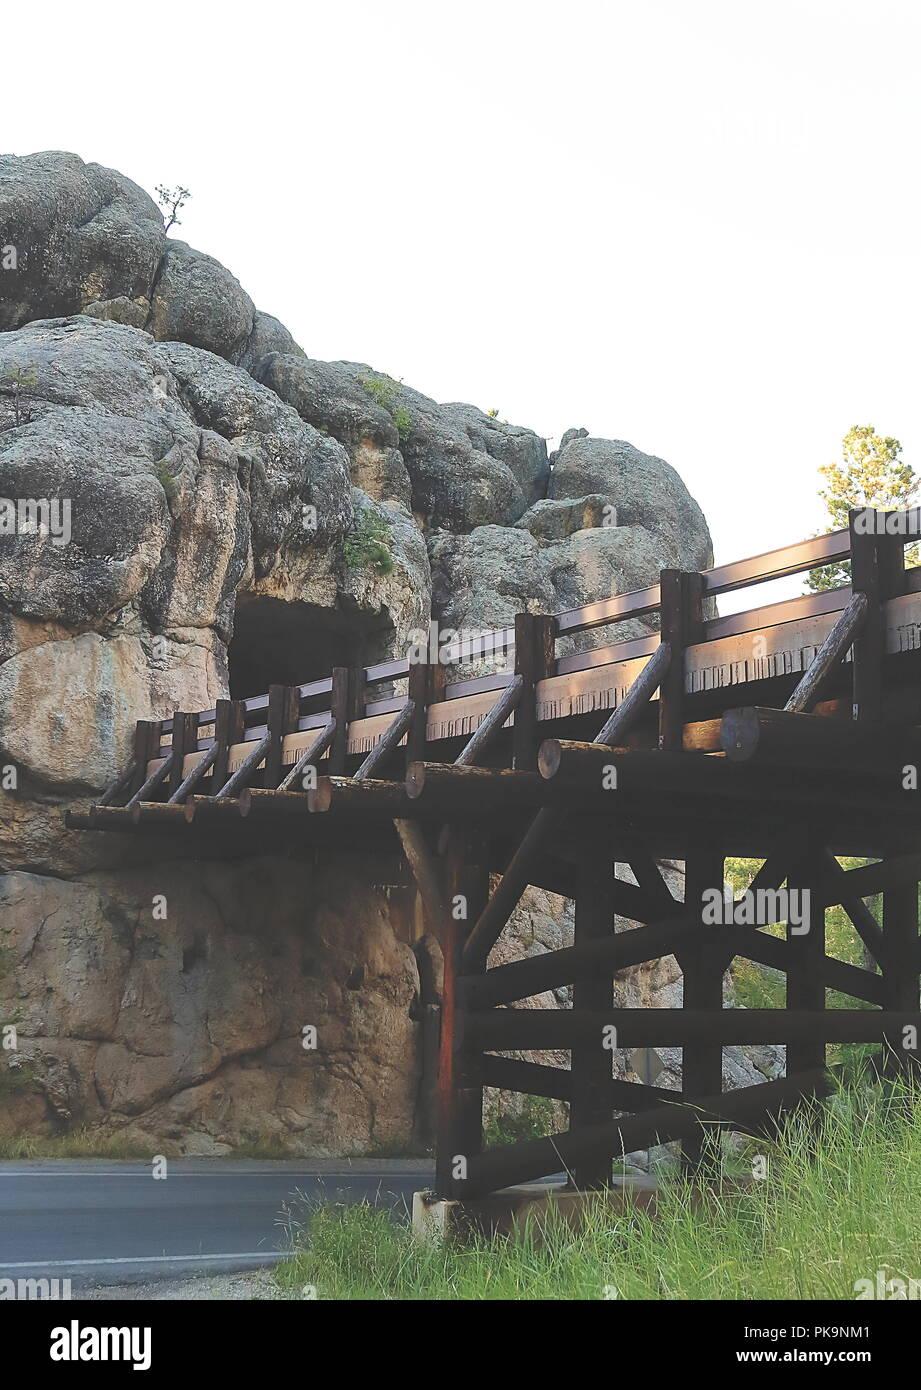 View of C.C. Gideon Tunnel and beautiful Bridge in Black Hills, South Dakota - Stock Image